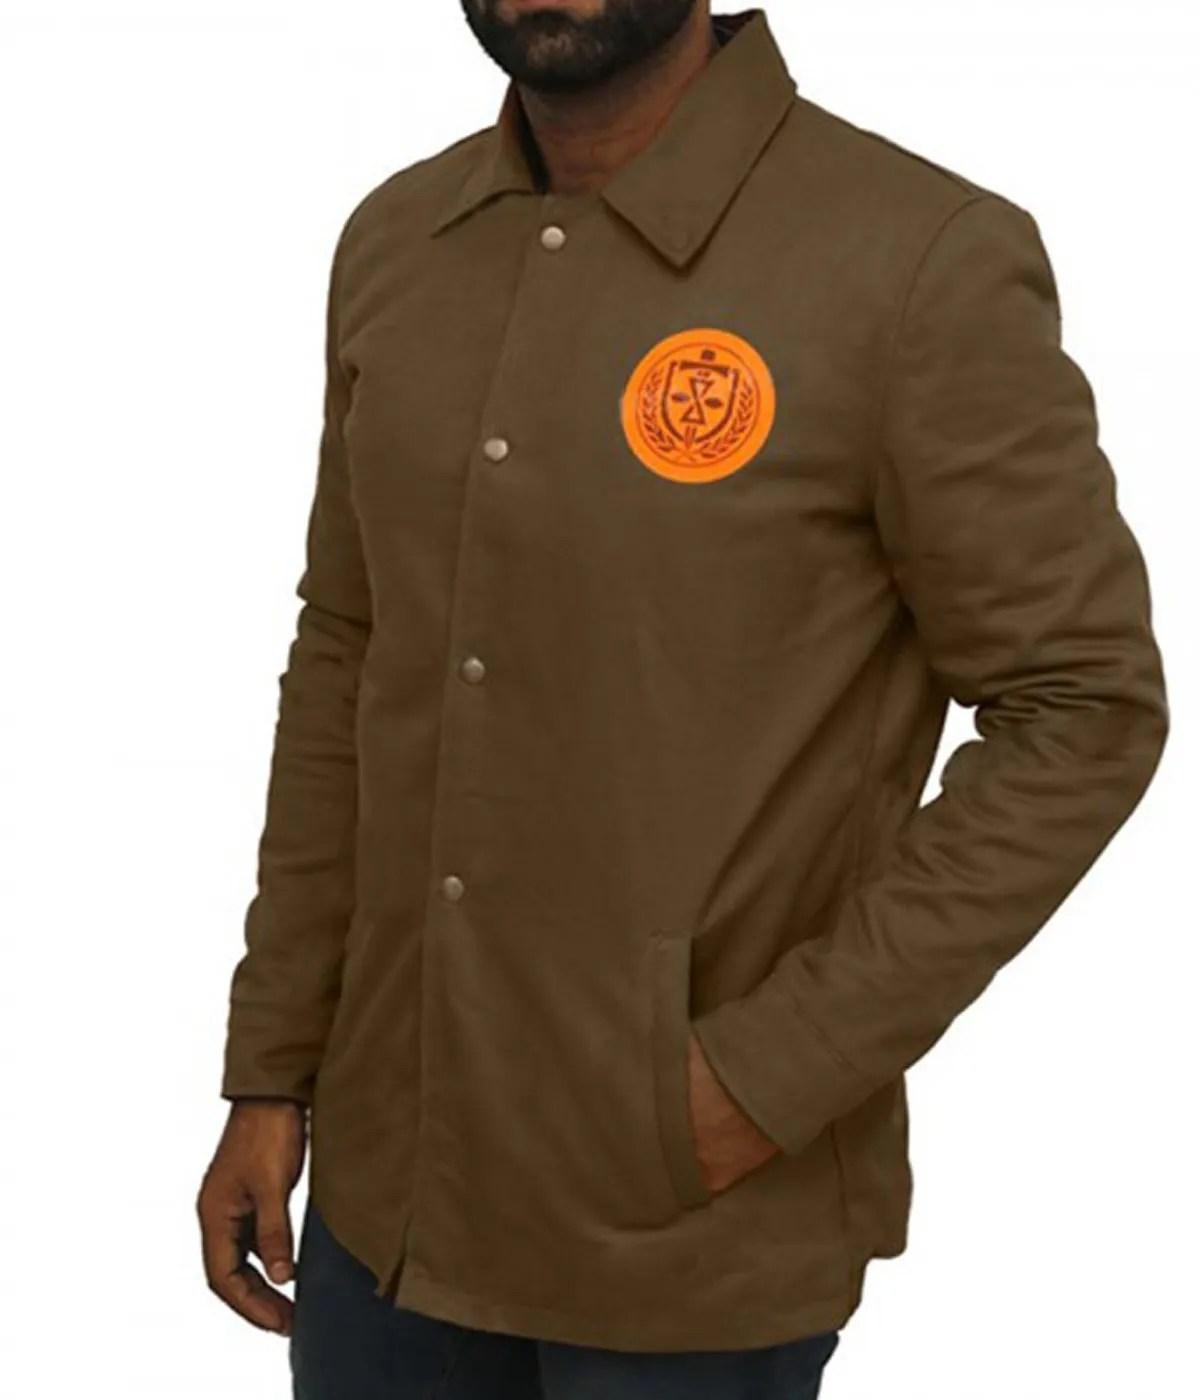 loki-tom-hiddleston-brown-cotton-jacket